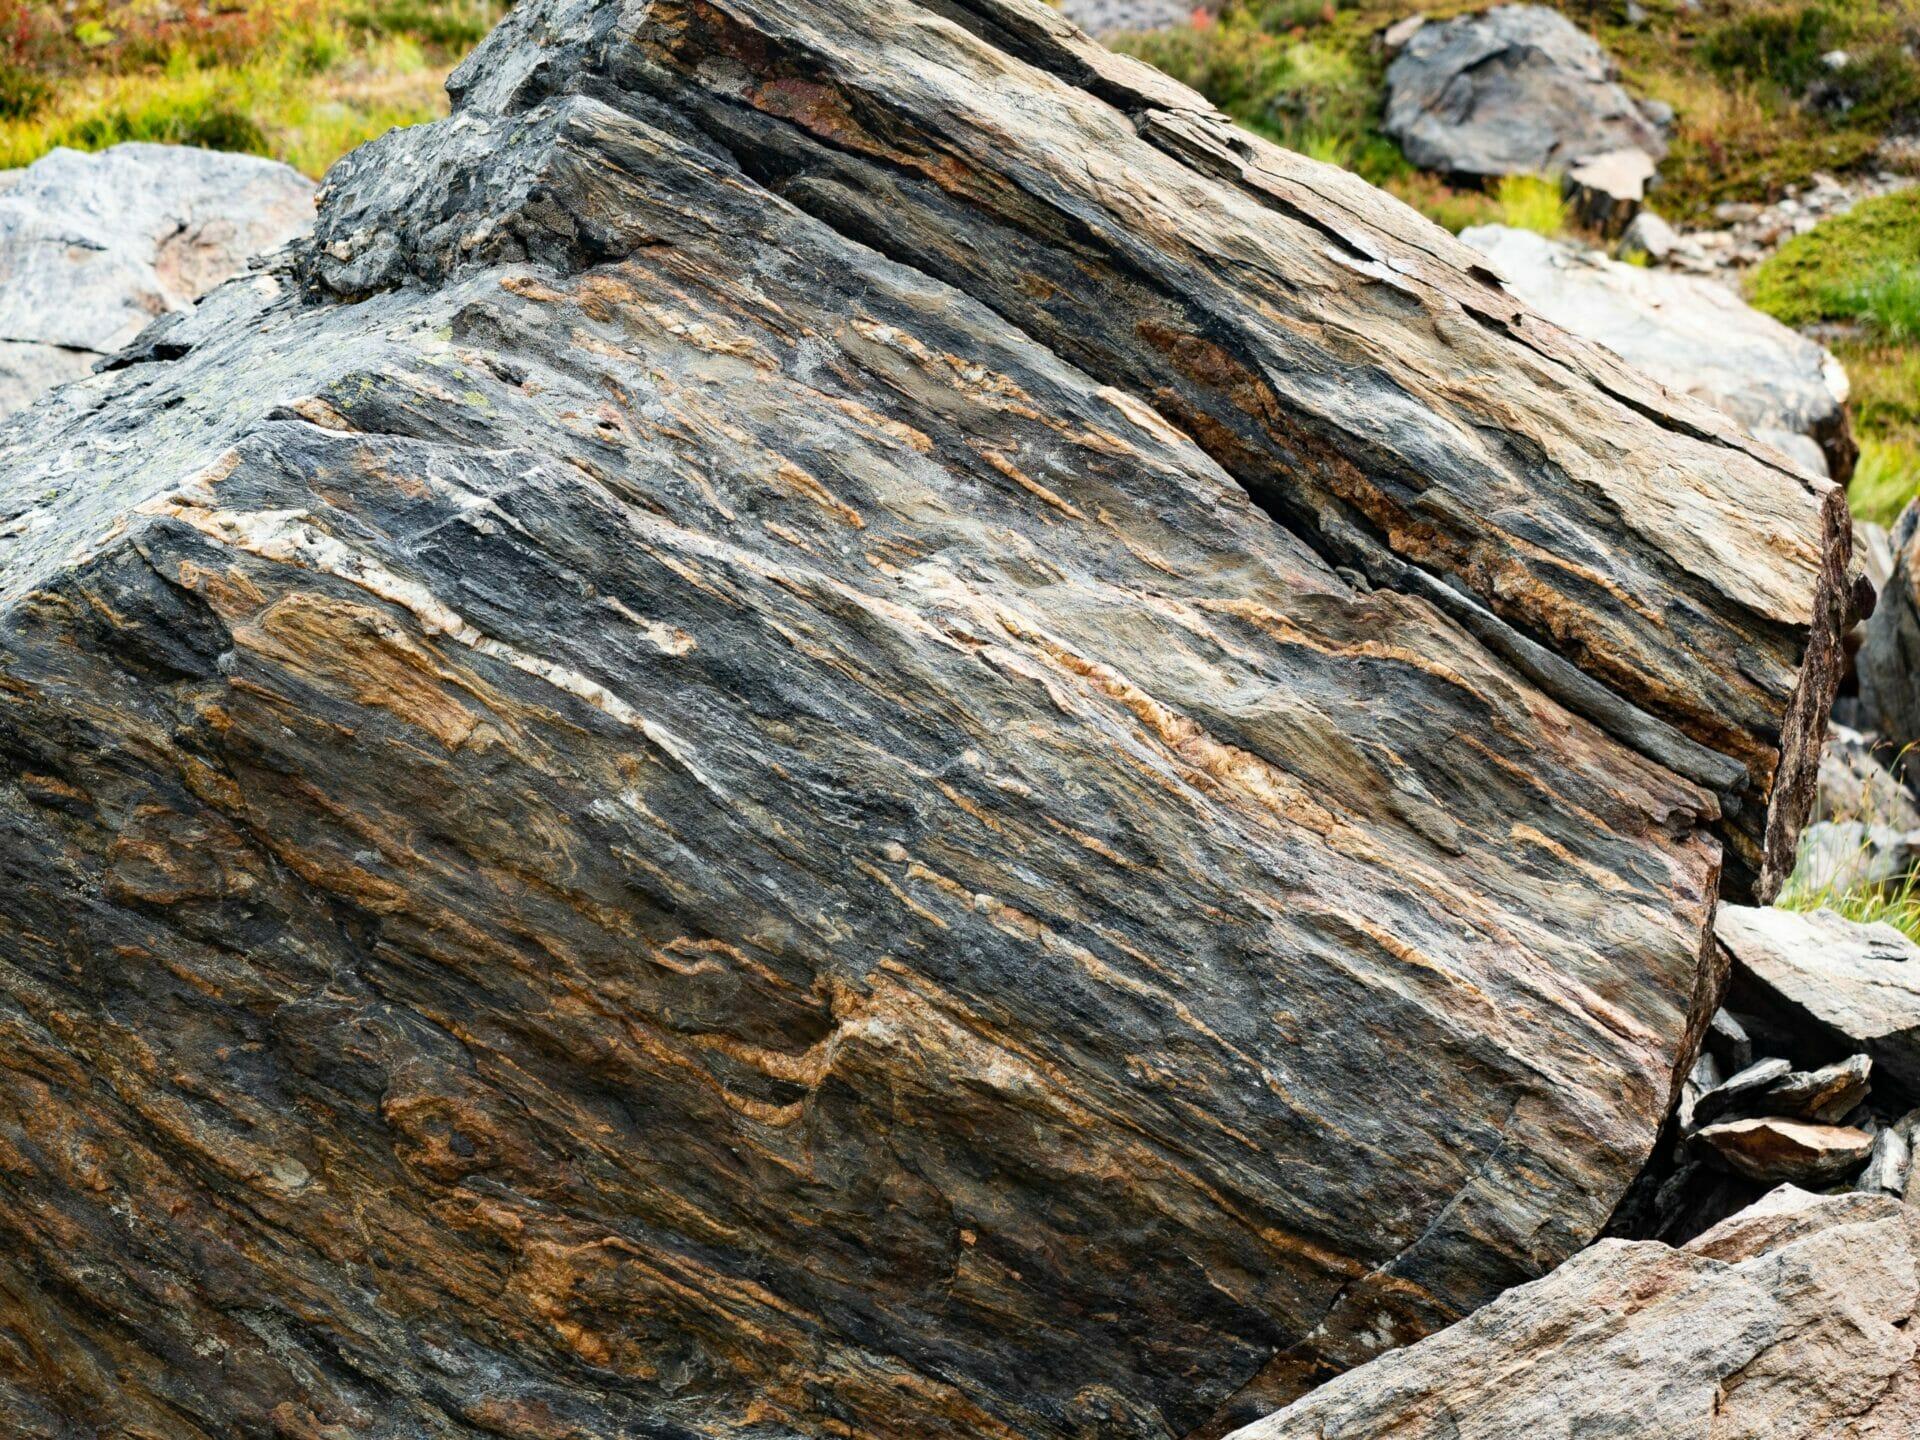 rock schist layers